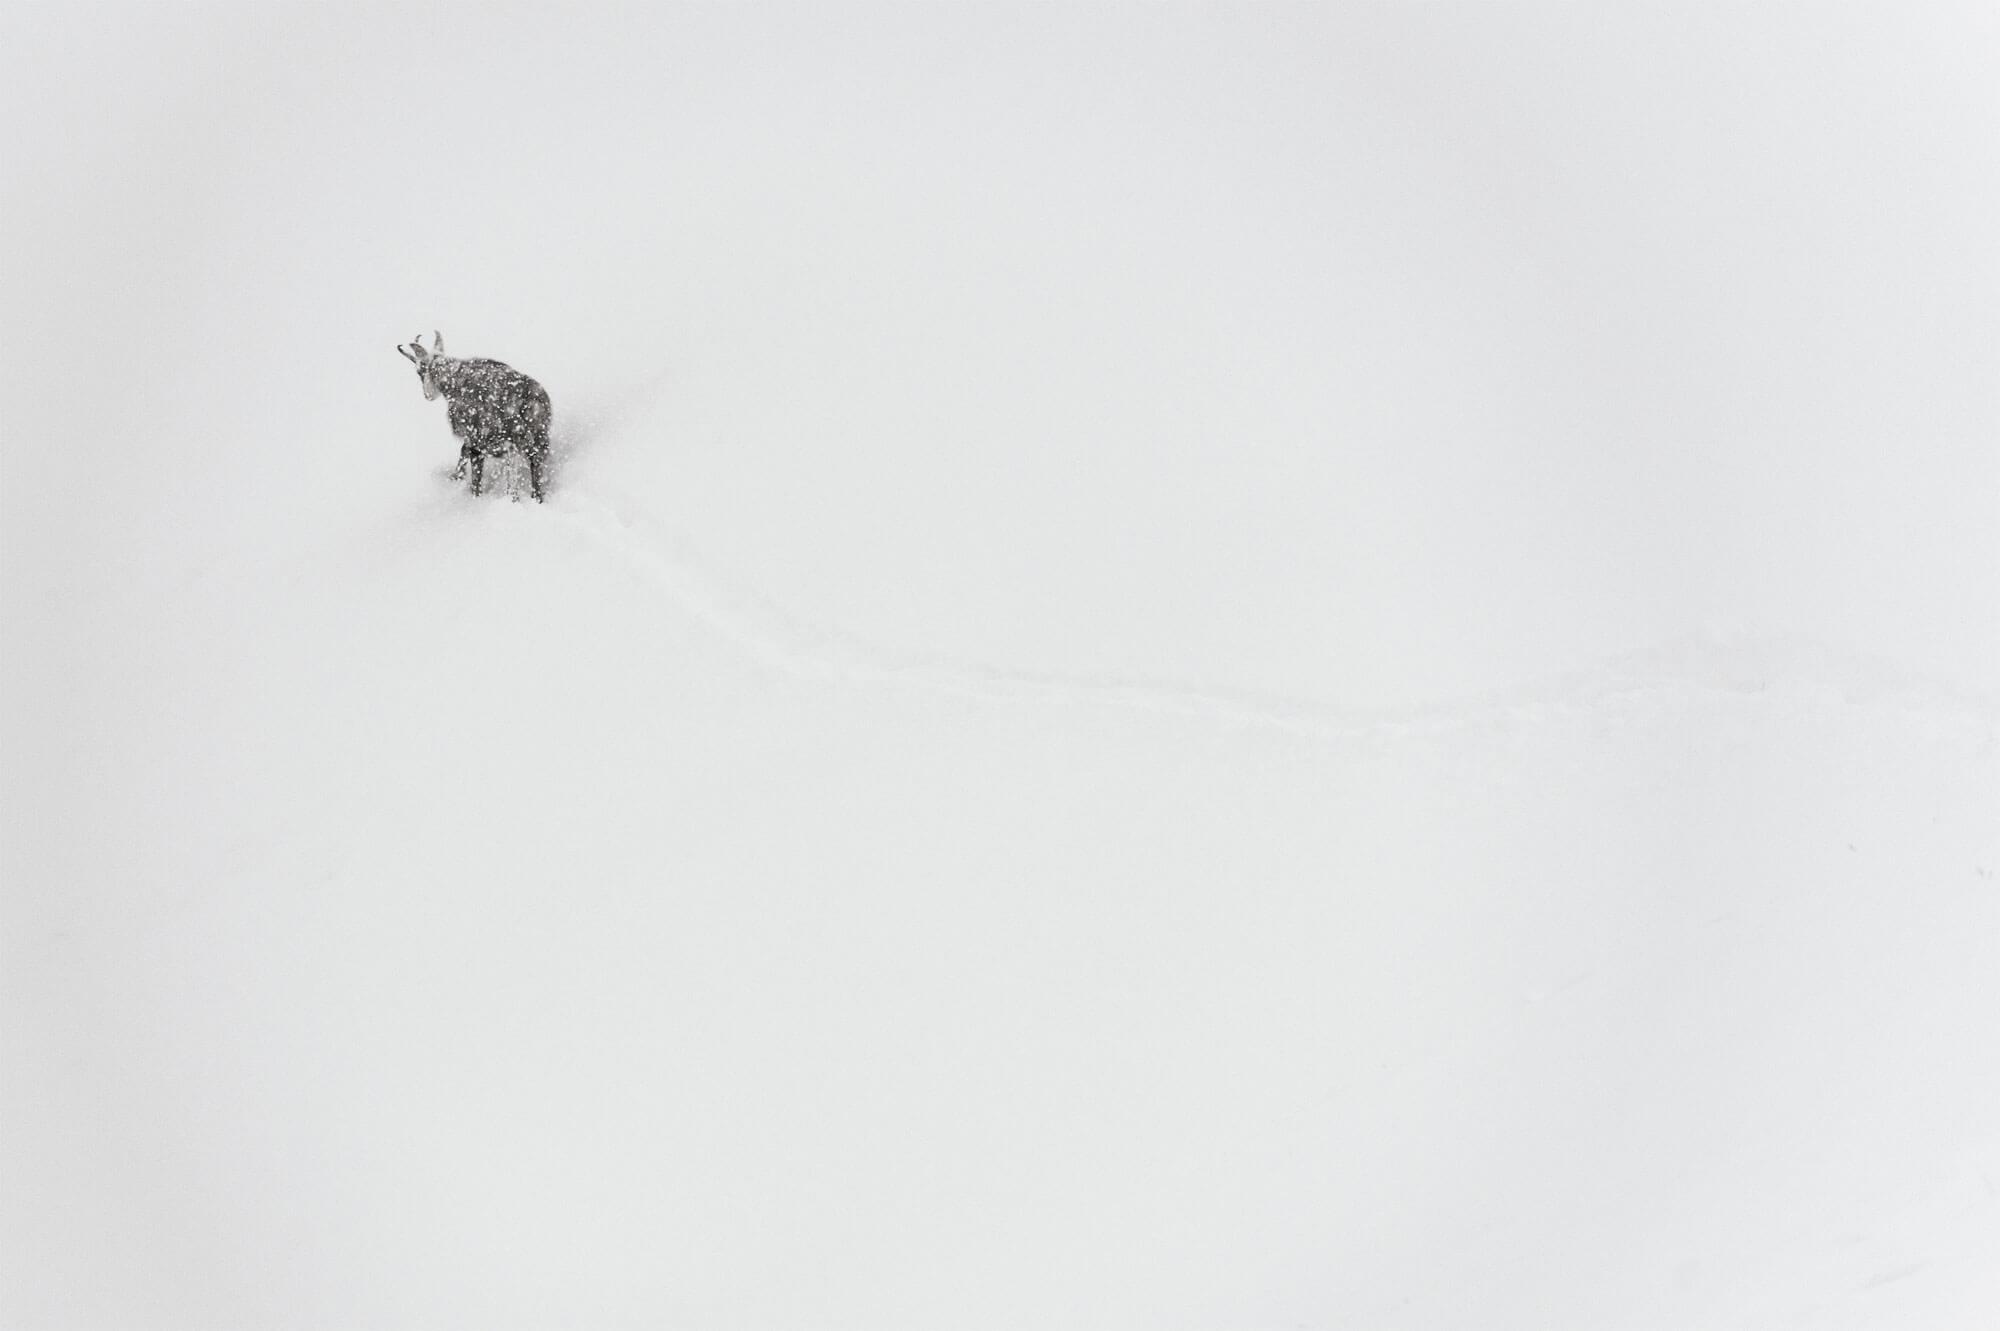 Chamois bravant la neige